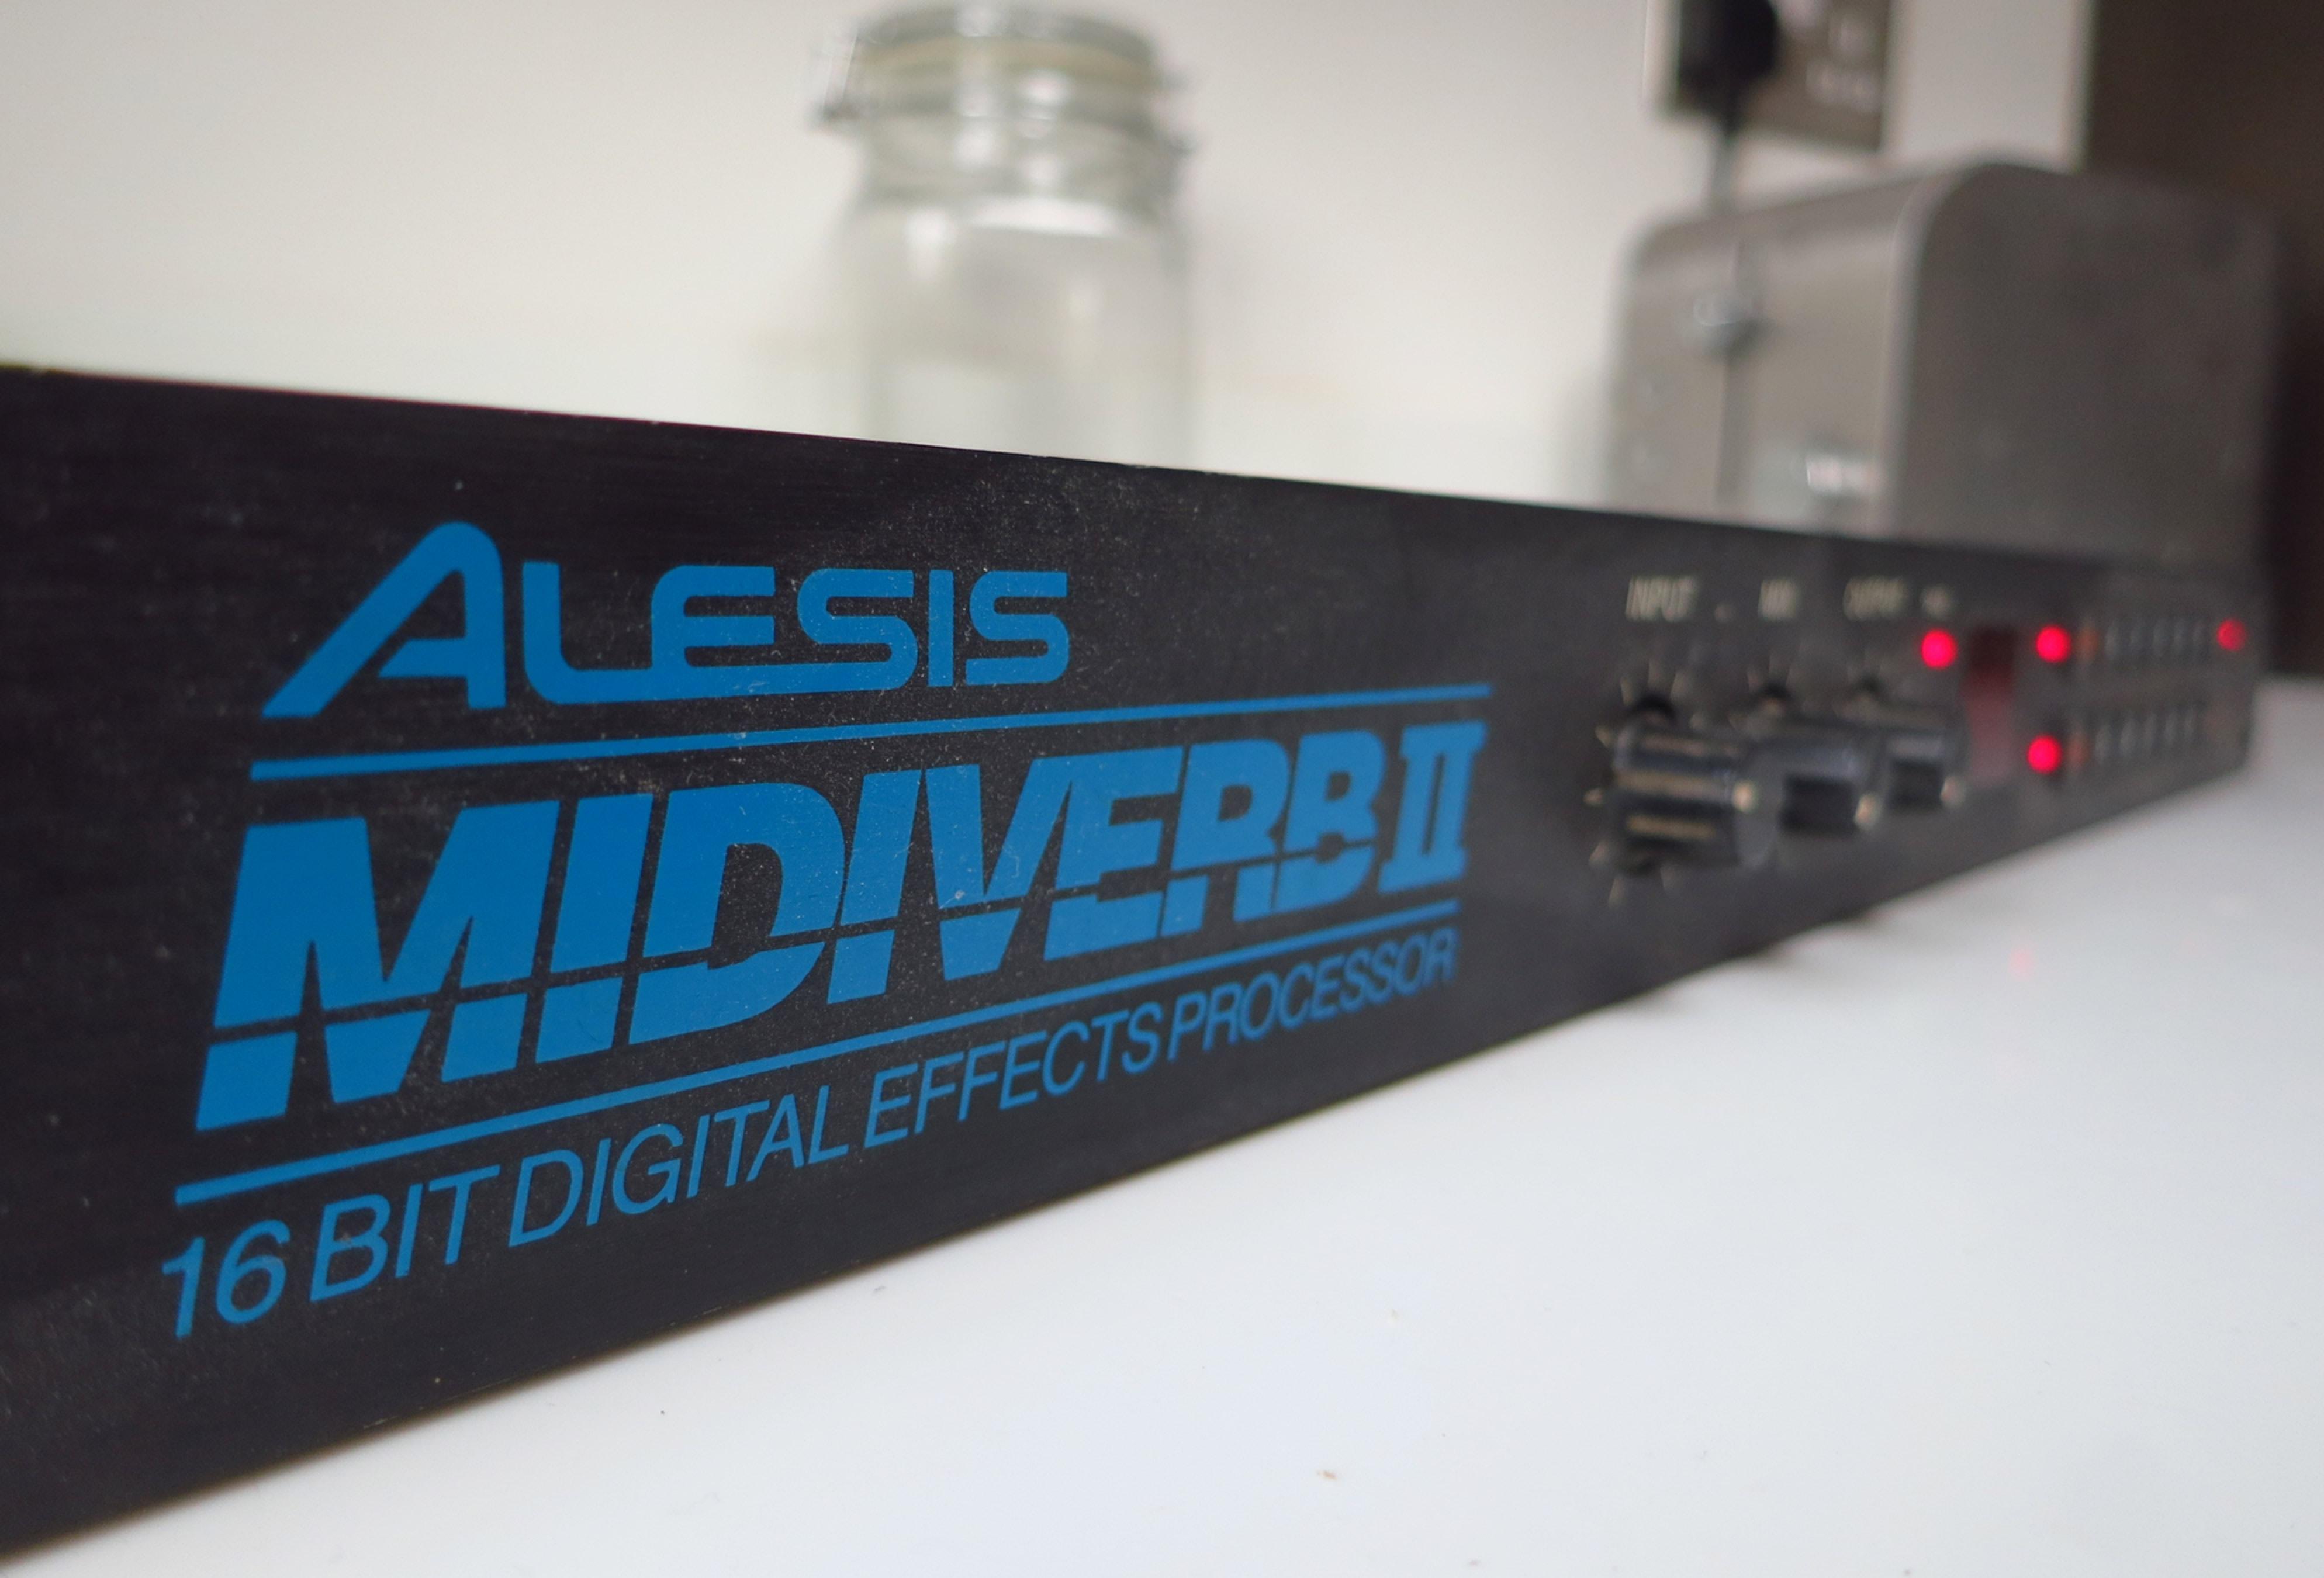 Alesis Midiverb II front panel